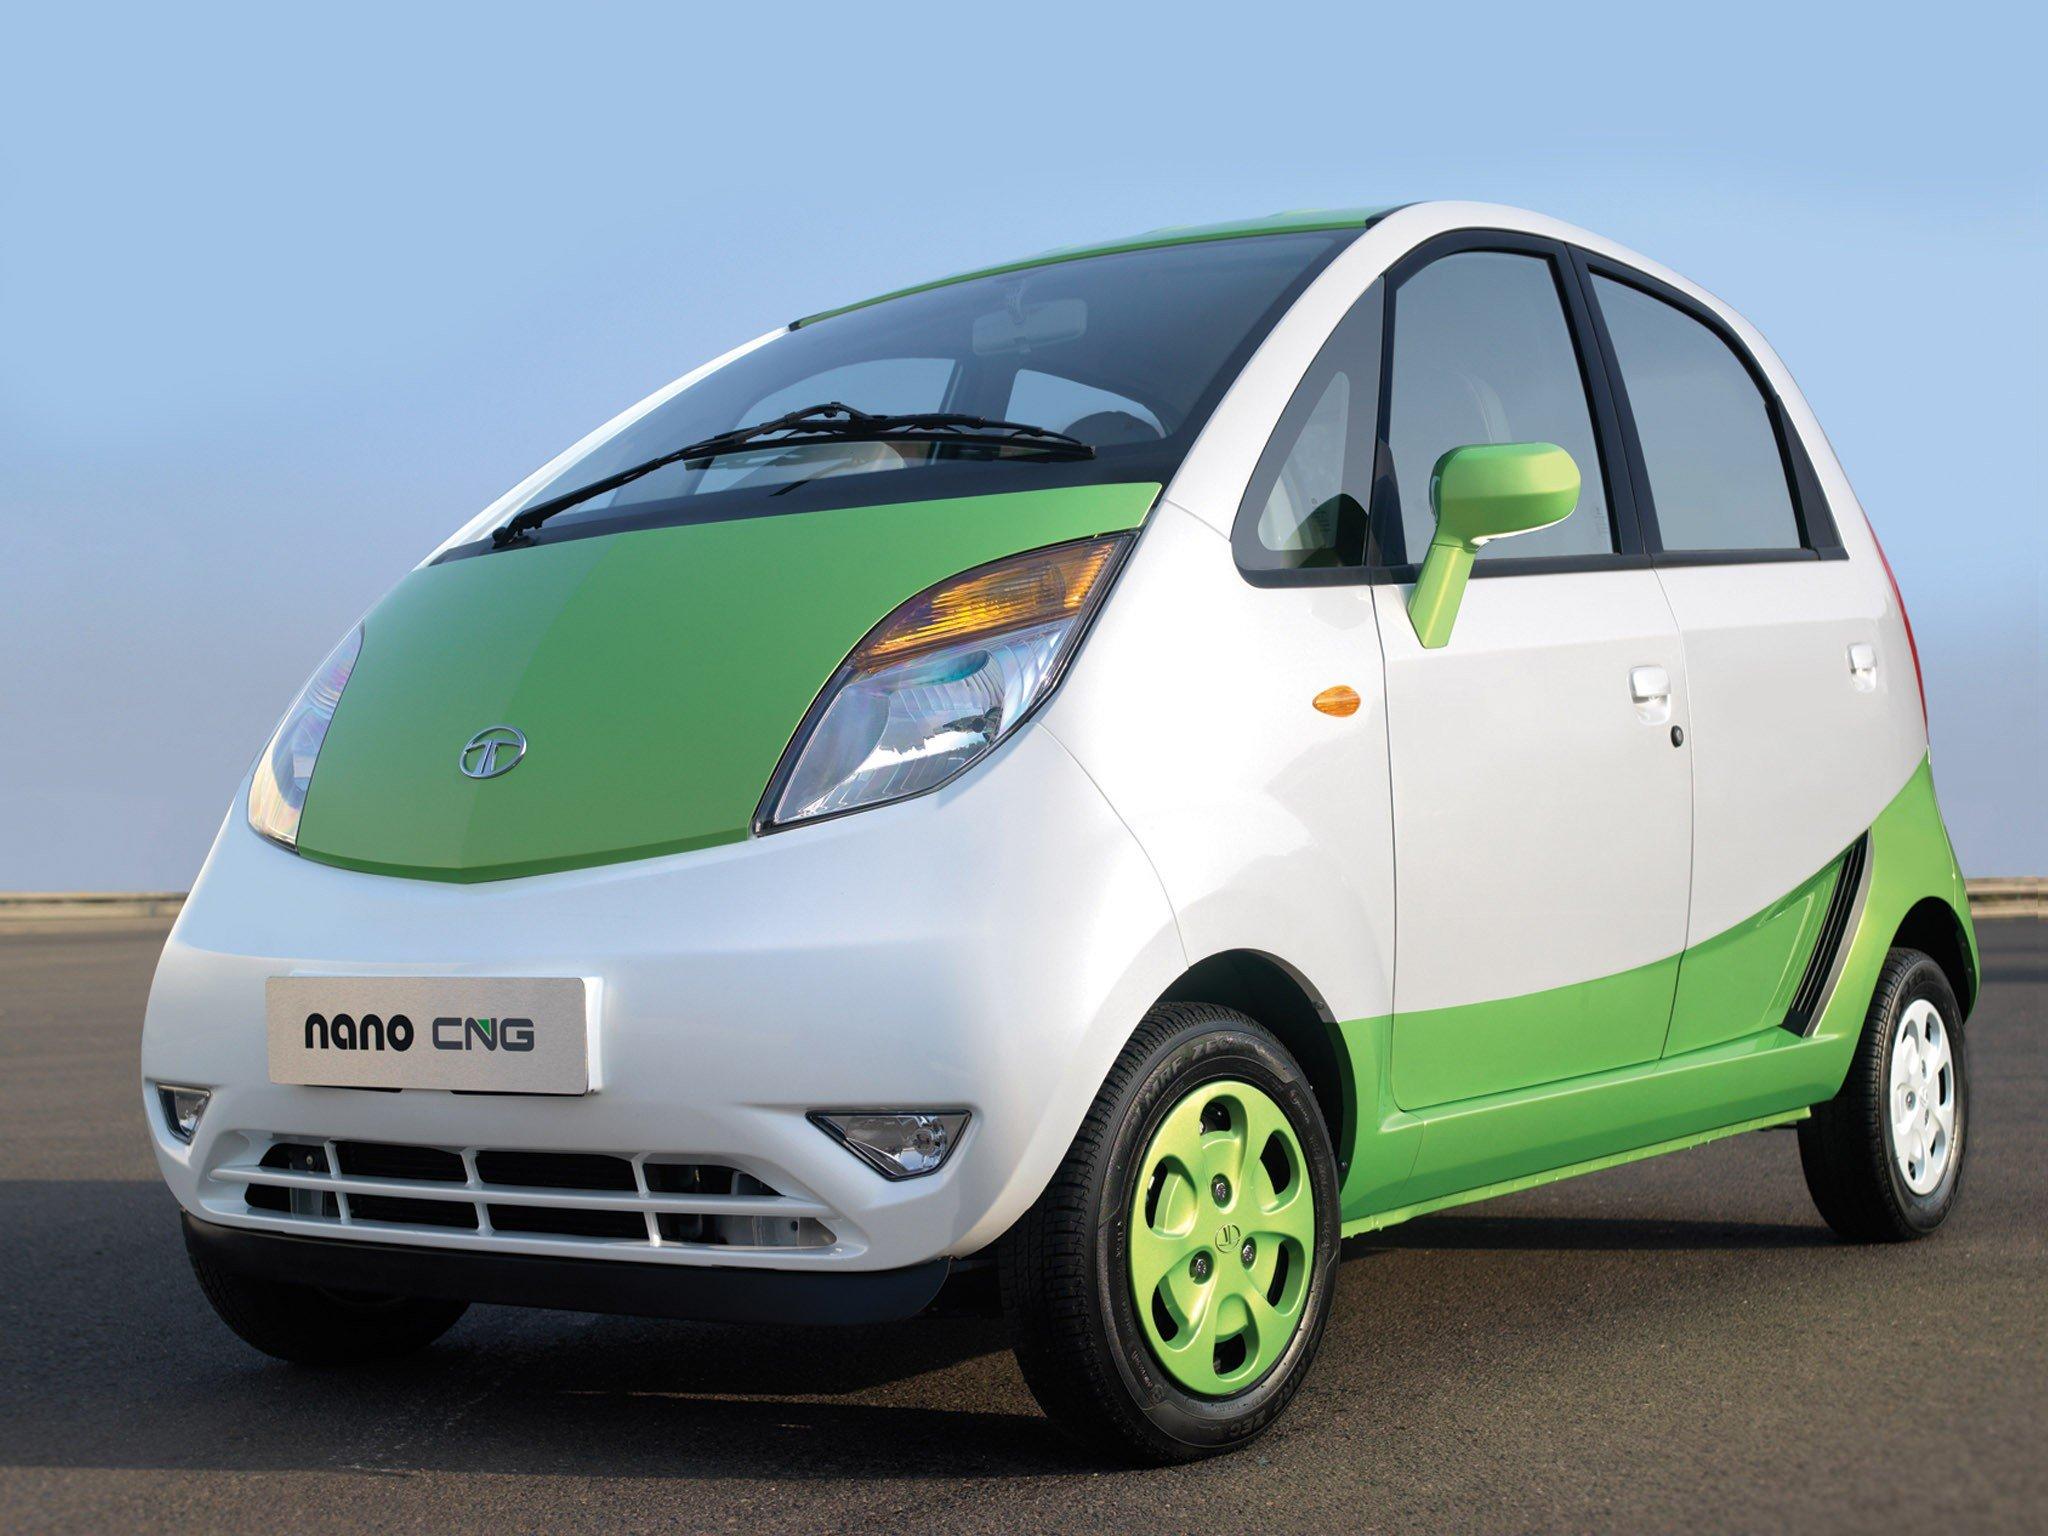 Design of tata nano car - Design Of Tata Nano Car 3